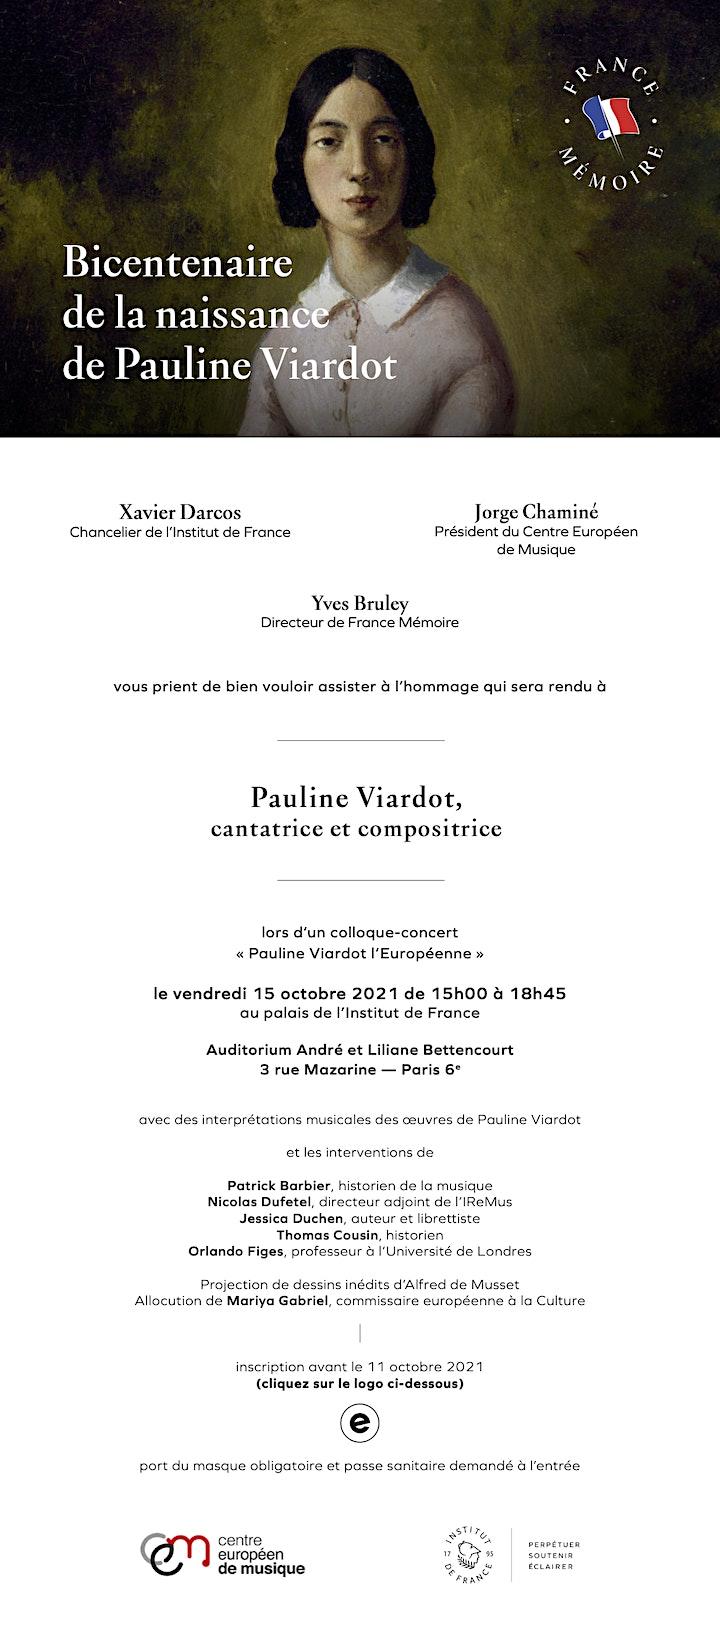 Bicentenaire de la naissance de Pauline Viardot image